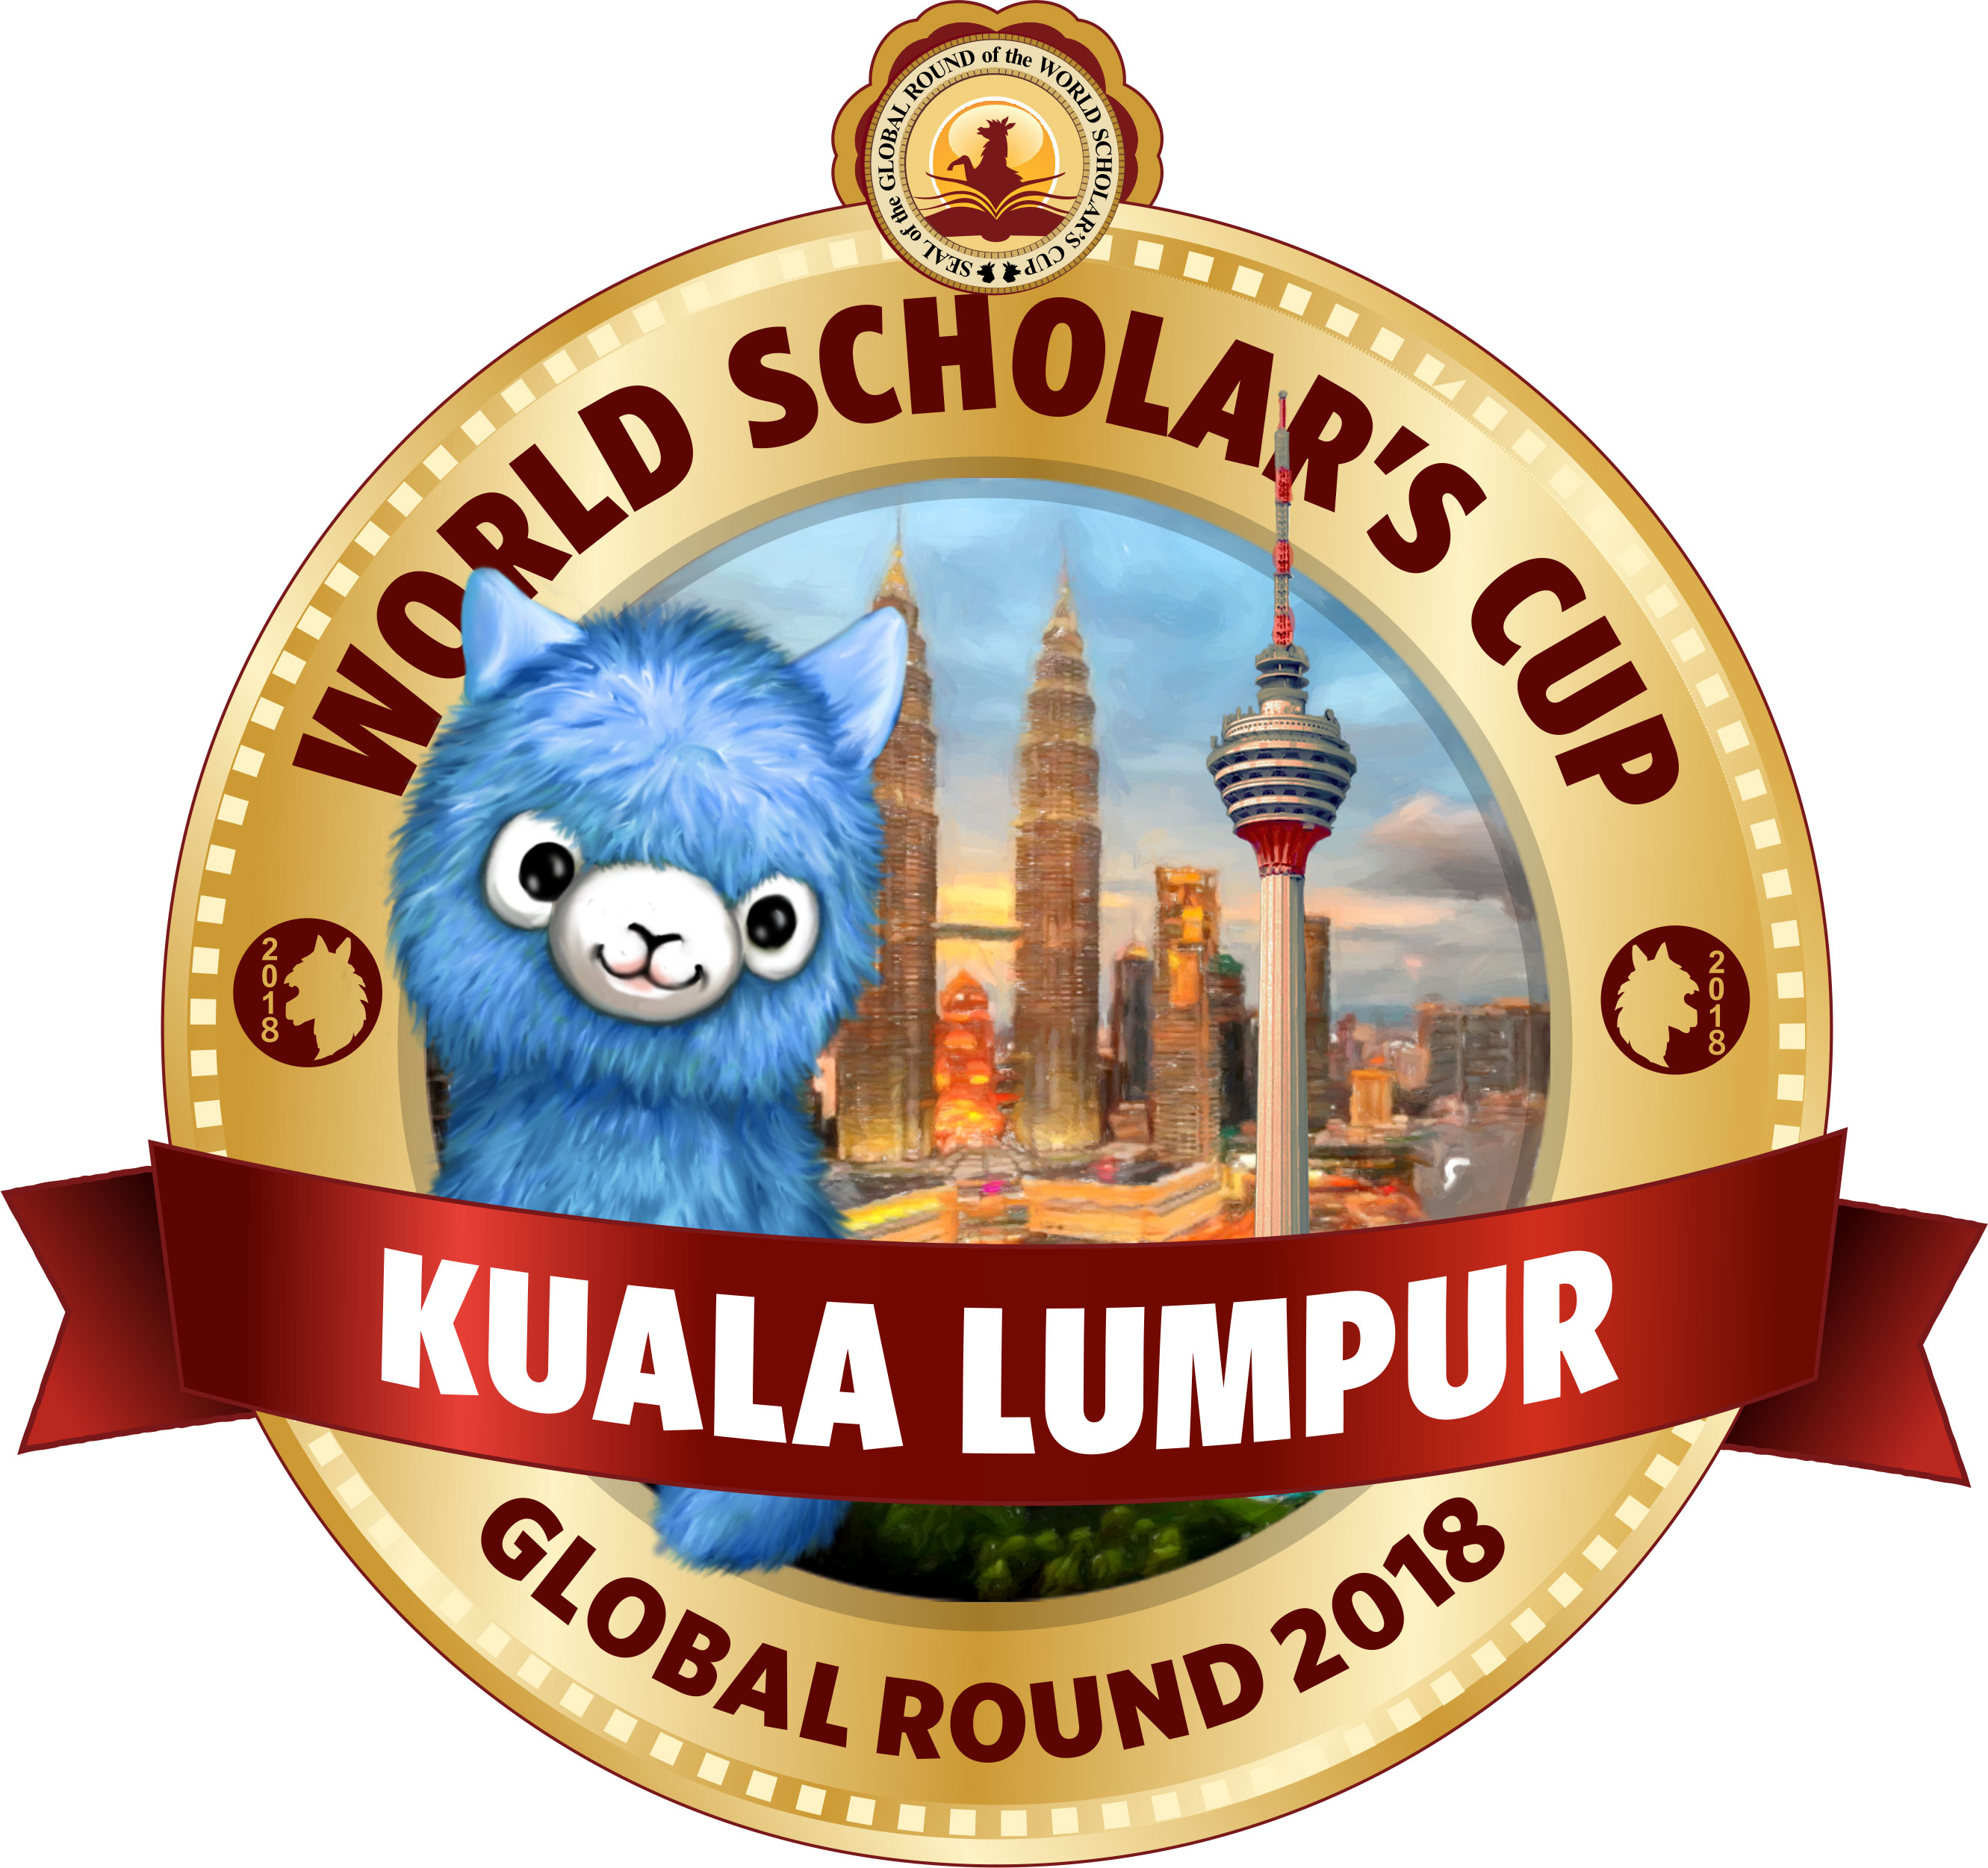 Tham Dự Cuộc Thi The World Scholar's Cup Tại Kuala Lumpur, Malaysia